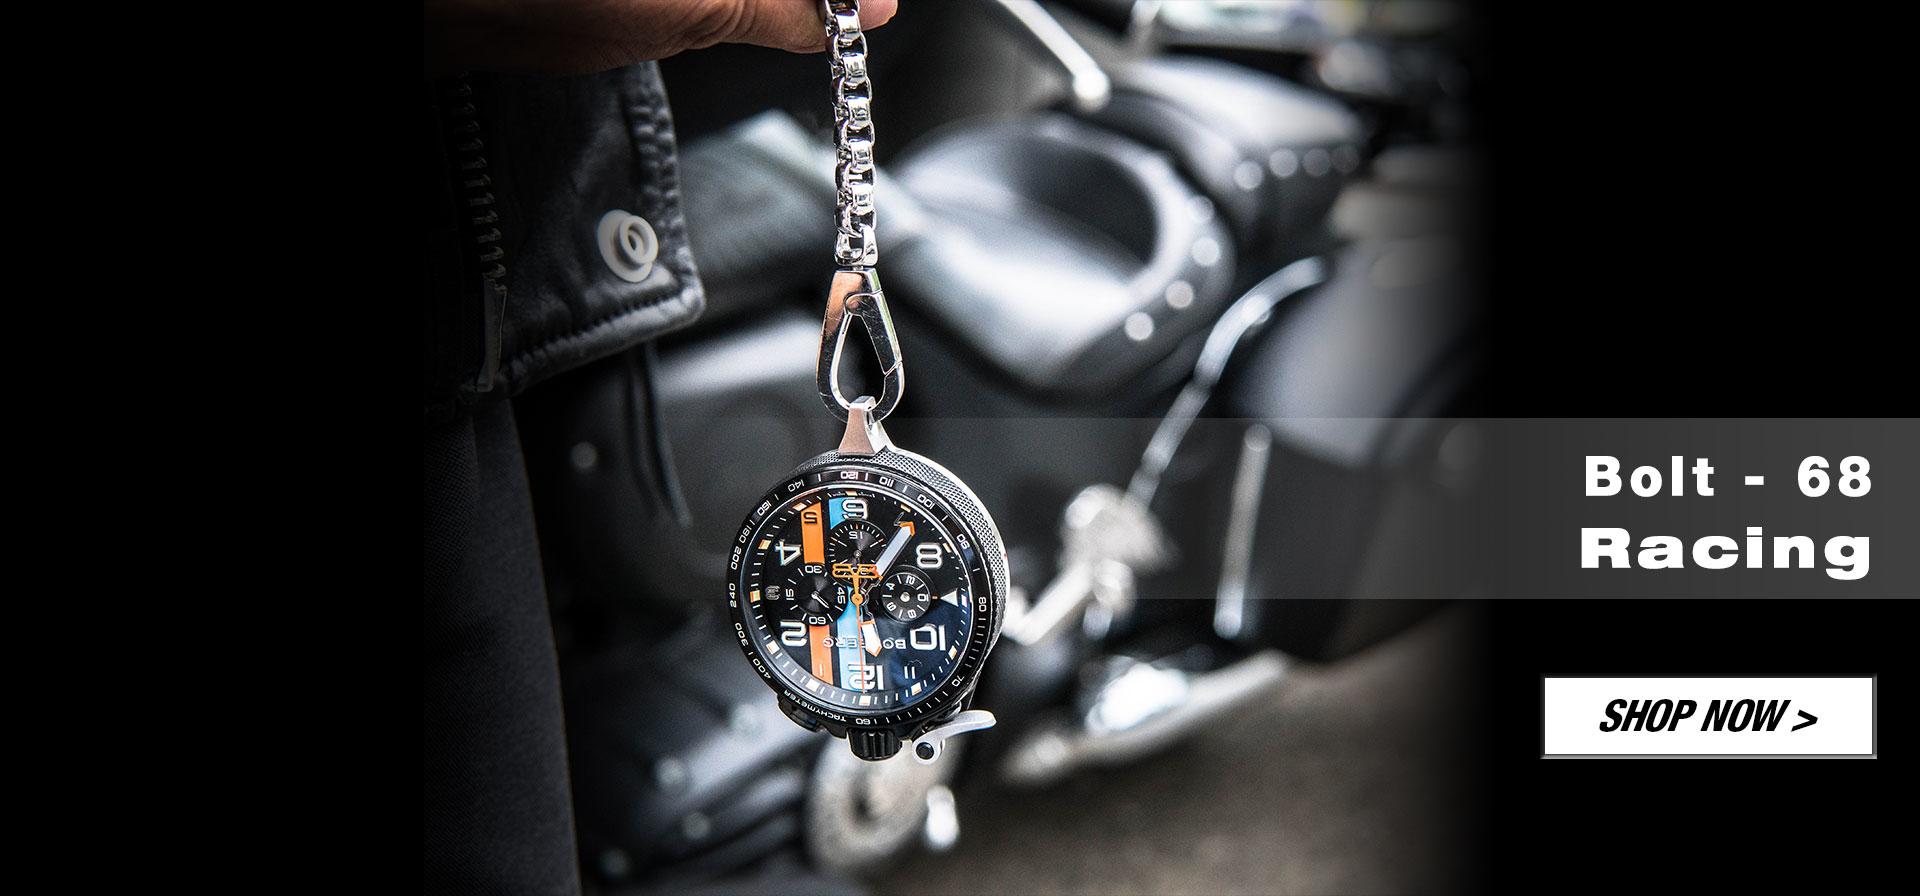 BOMBERG ,bolt-68-racing,bolt-68,奧創,ultra gears,racing